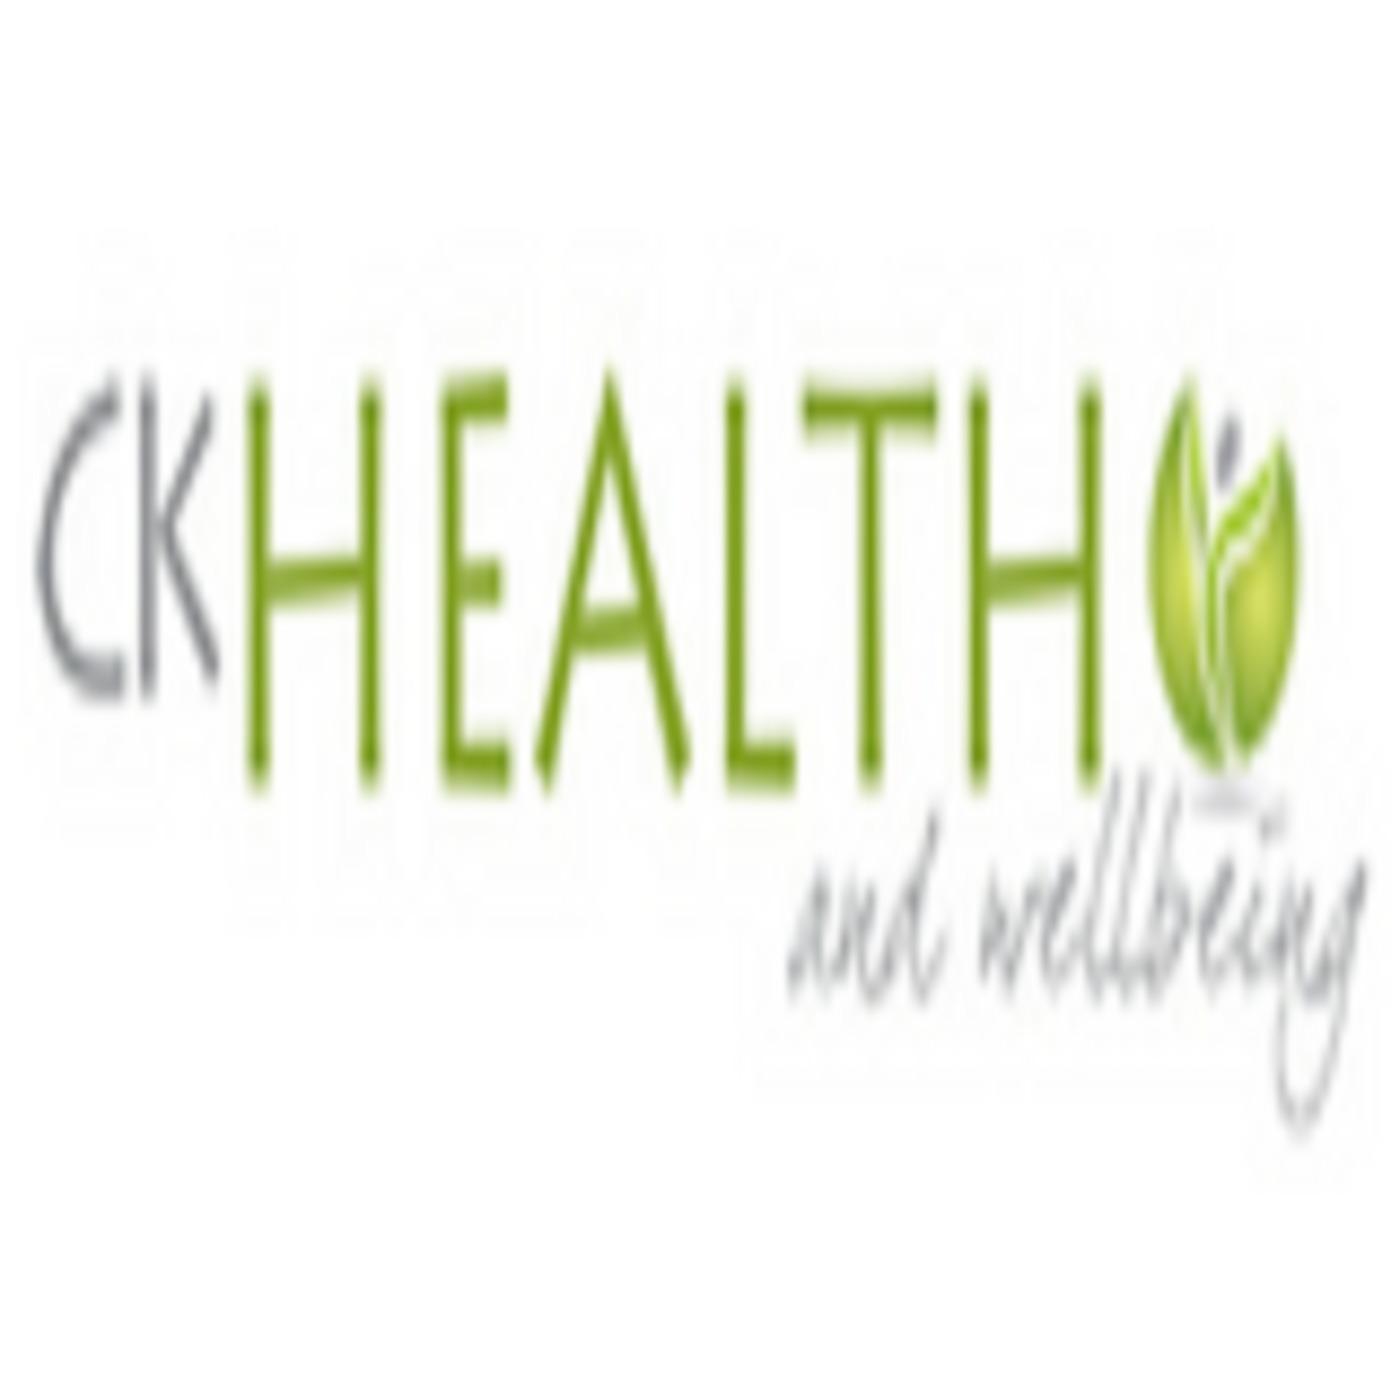 CK Health (@ckhealthnaturopathnewcastle2) Cover Image